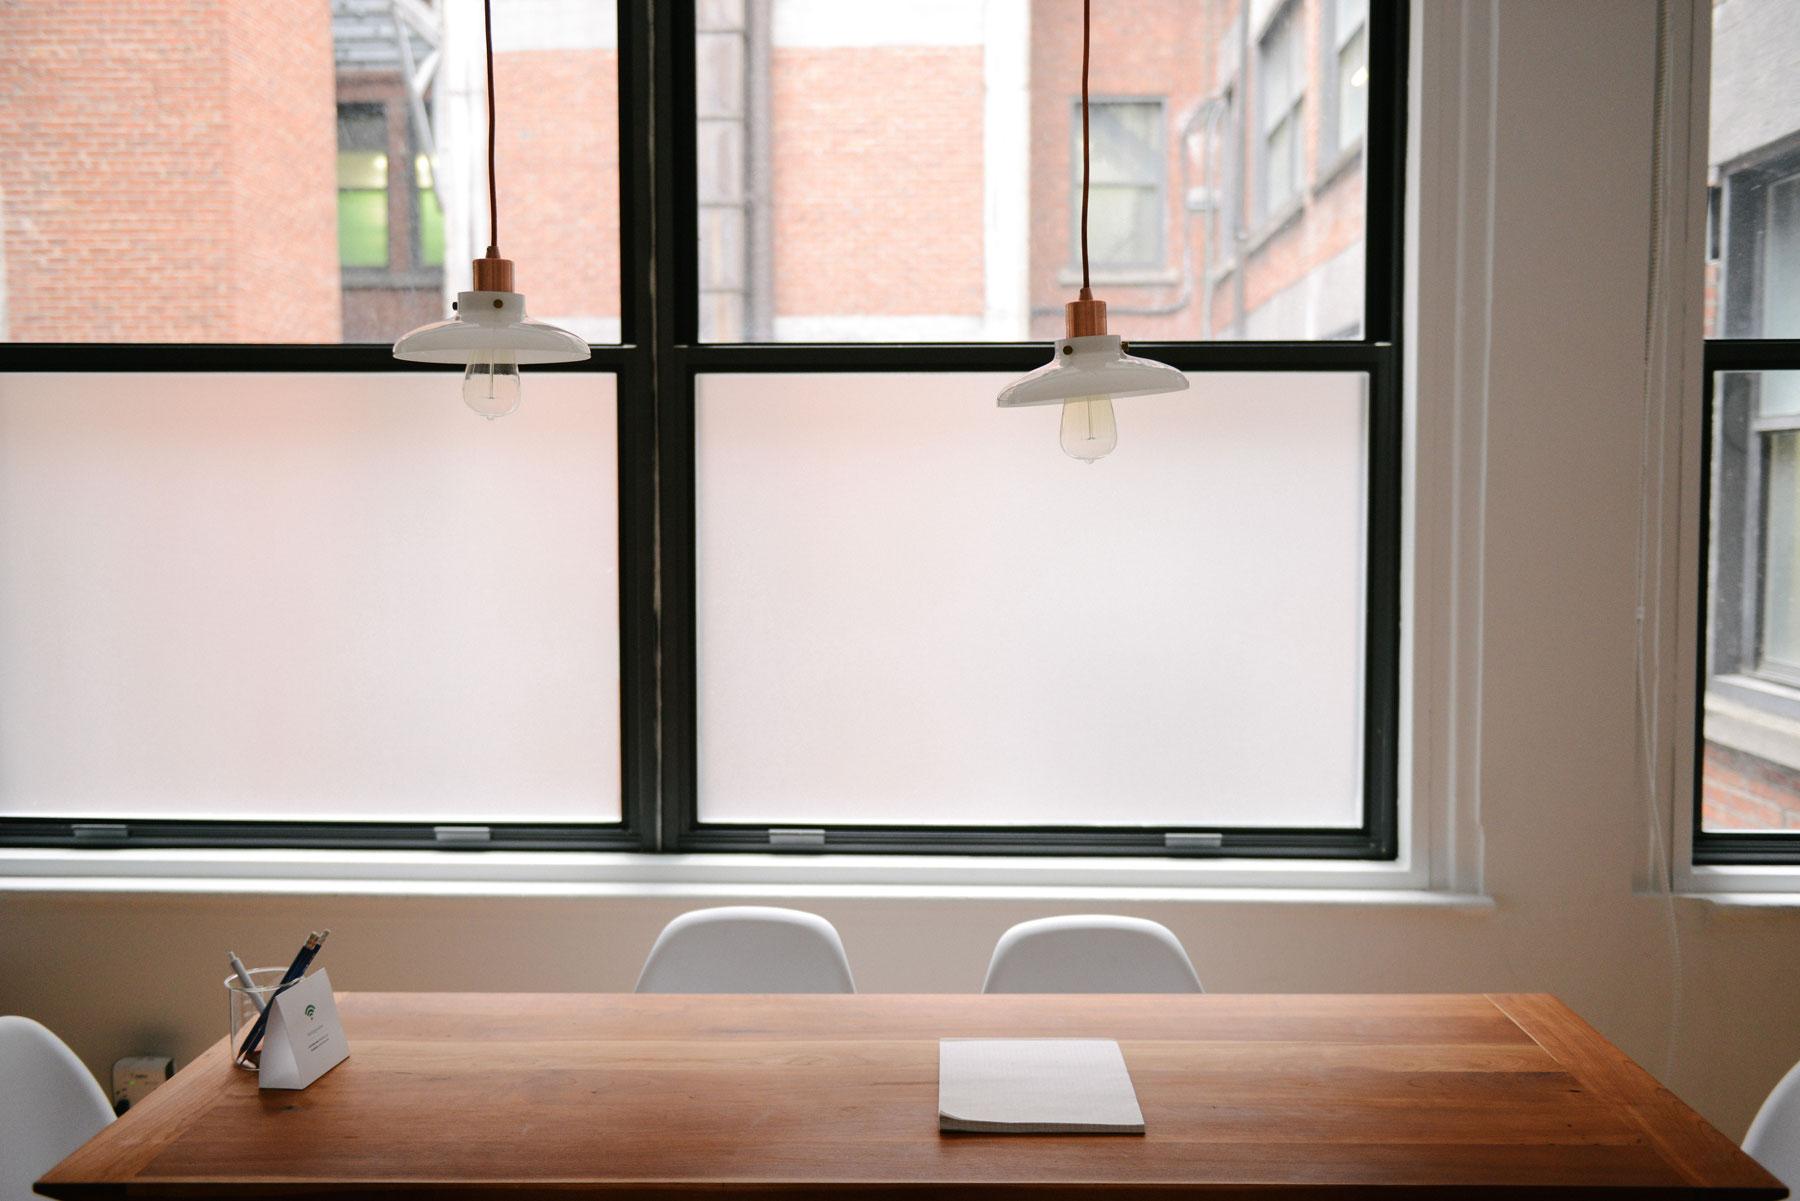 glass-window-meeting-room-montreal-vitrerie-jl